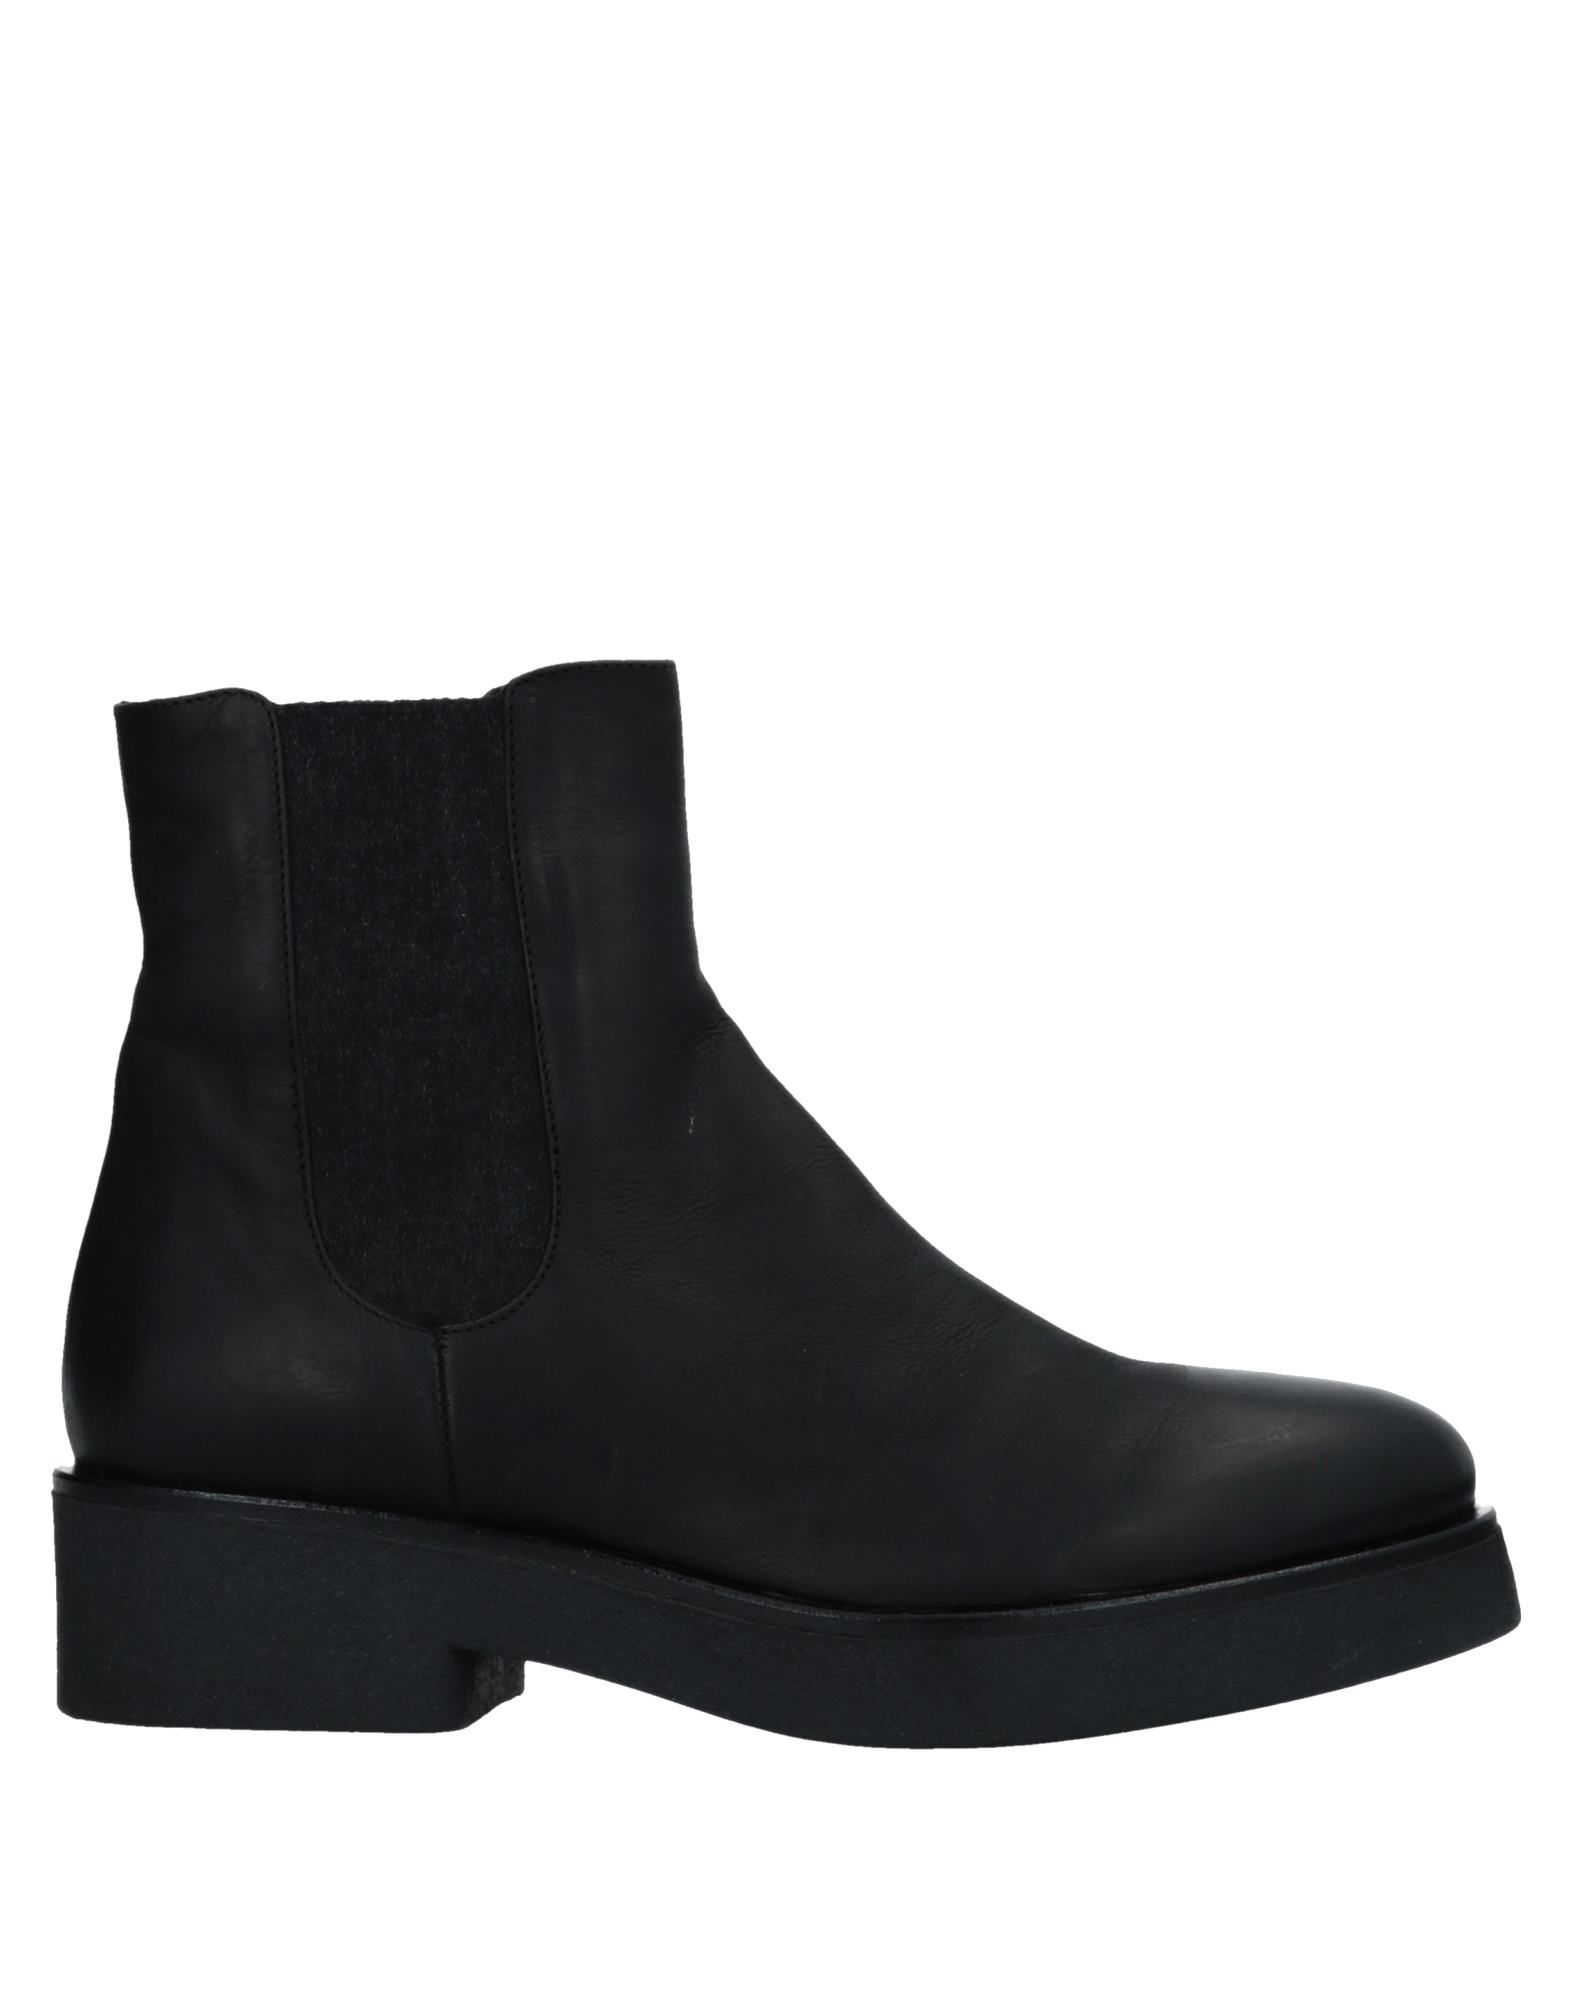 Stilvolle billige Schuhe Fru.It  Chelsea Stiefel Damen  Fru.It 11532798VA 9ac5ce